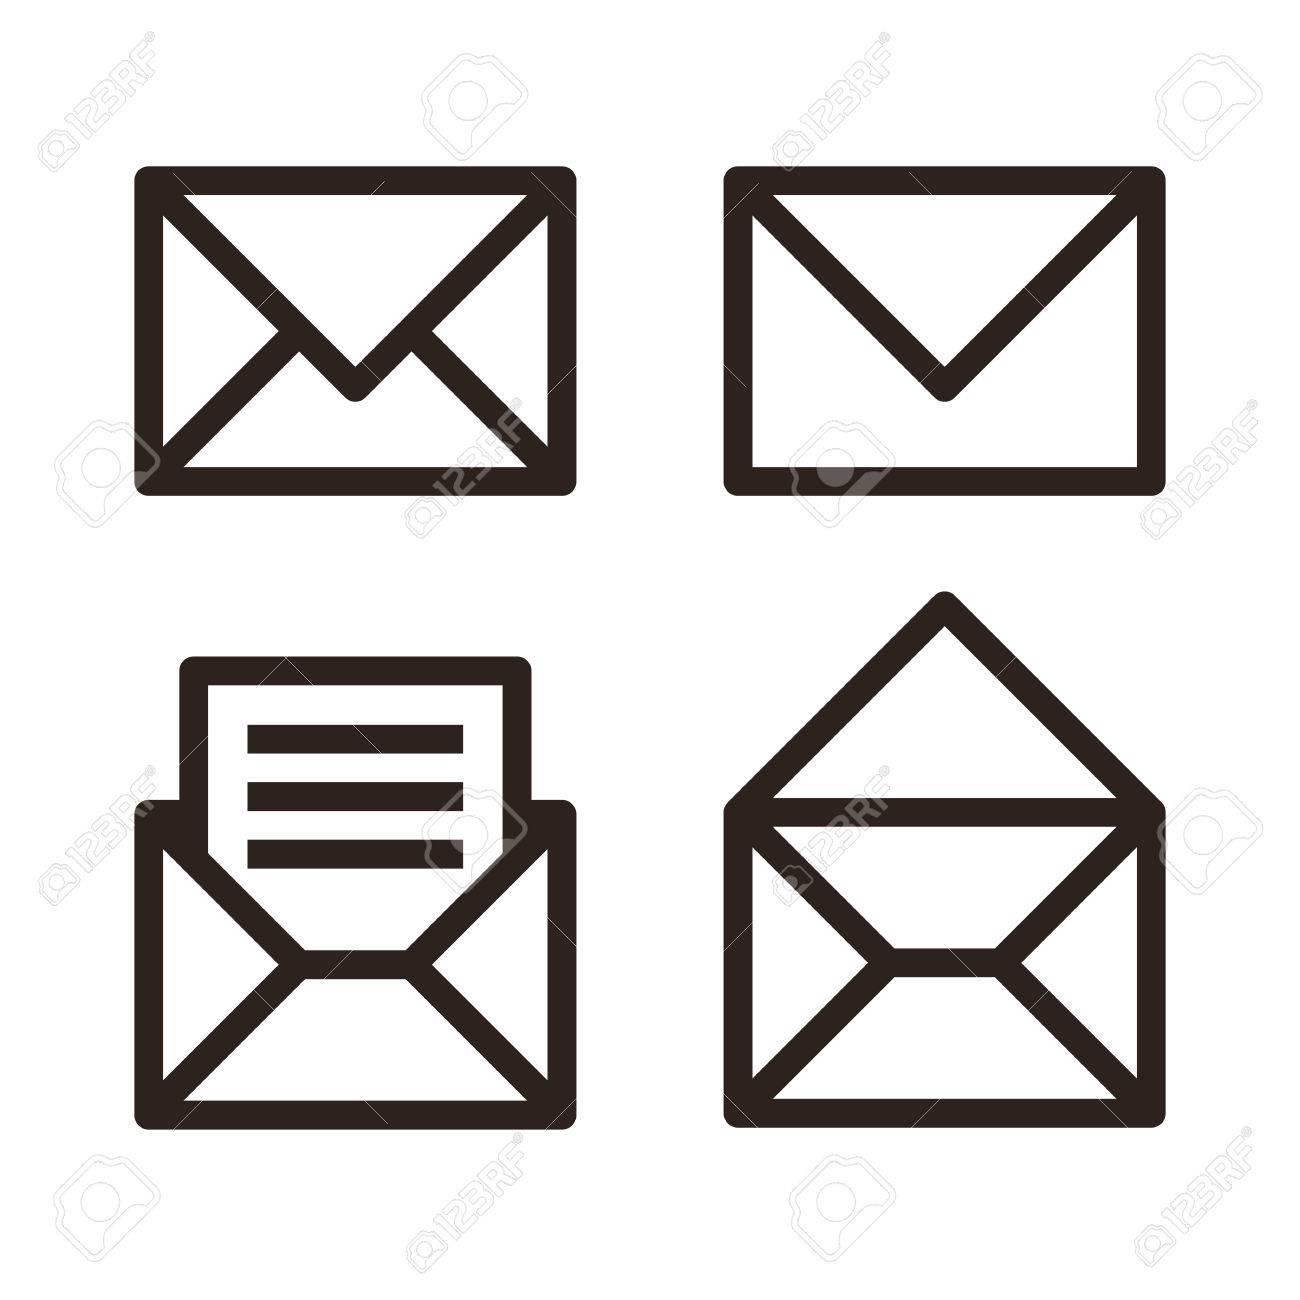 Mail icon set. Envelope sign isolated on white background - 51036576